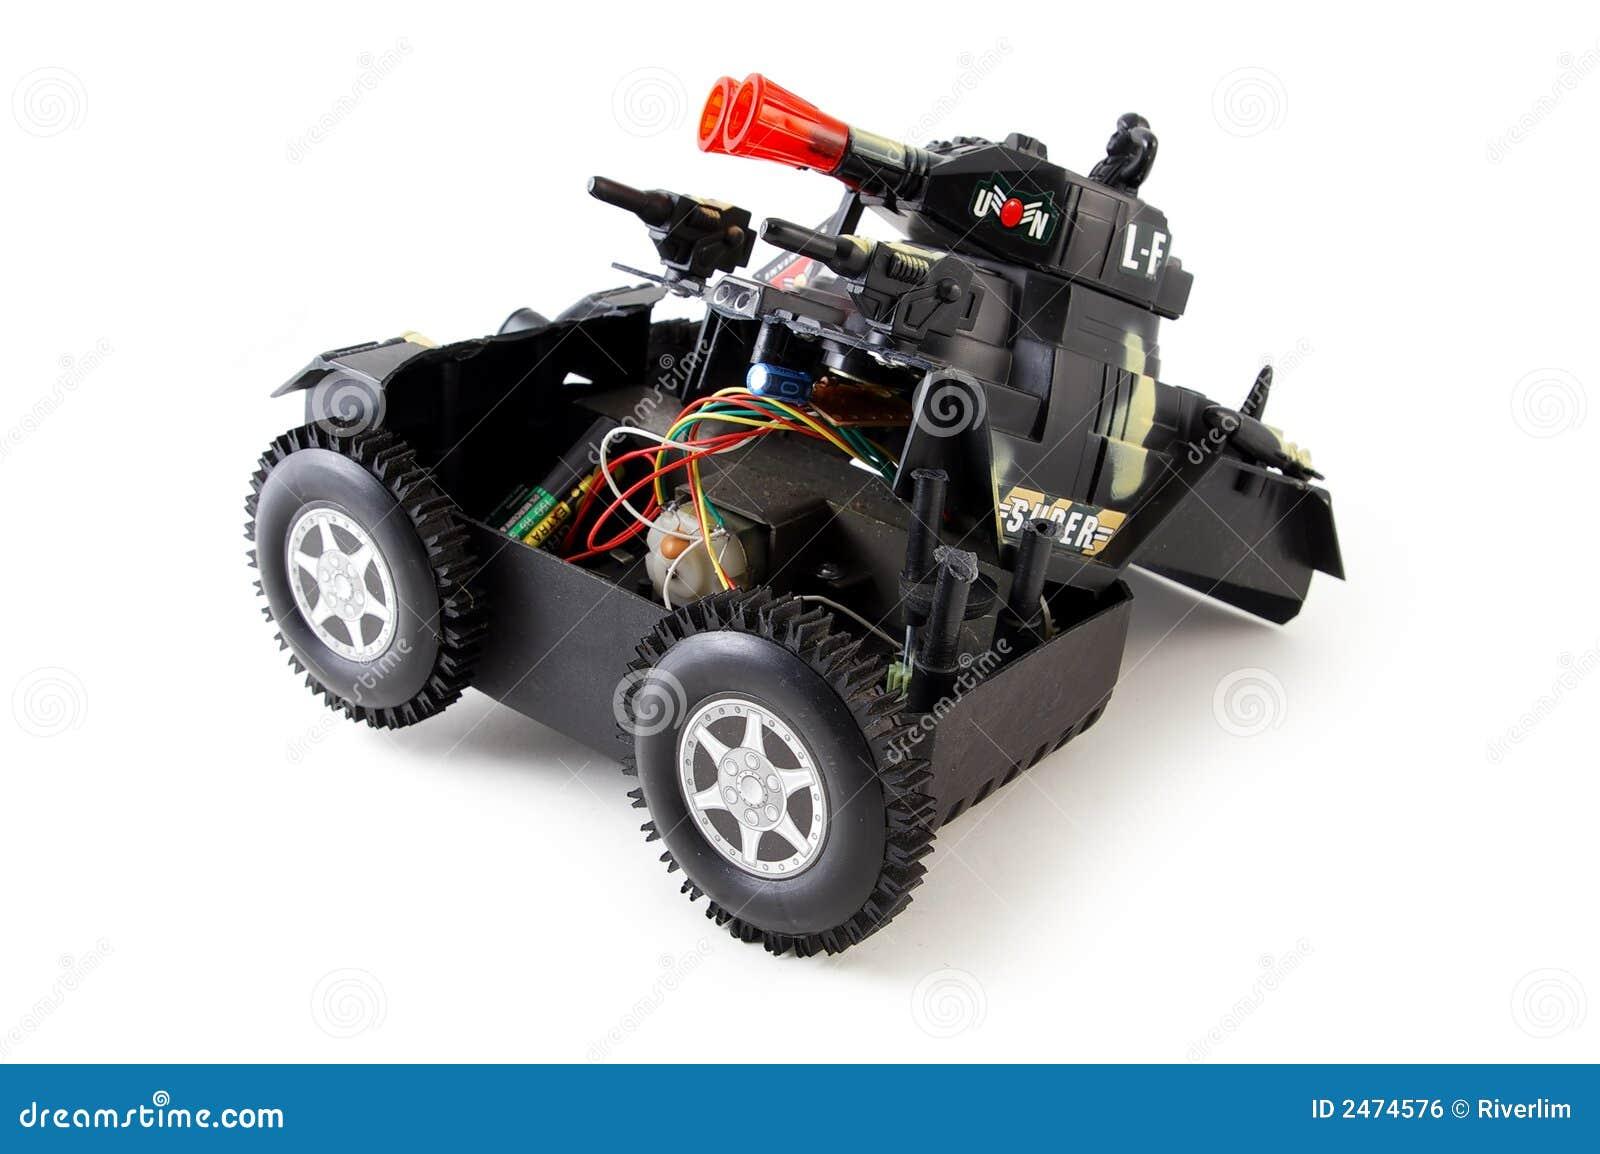 Brocken Used Toys : Broken toy stock photo image of toys transportation